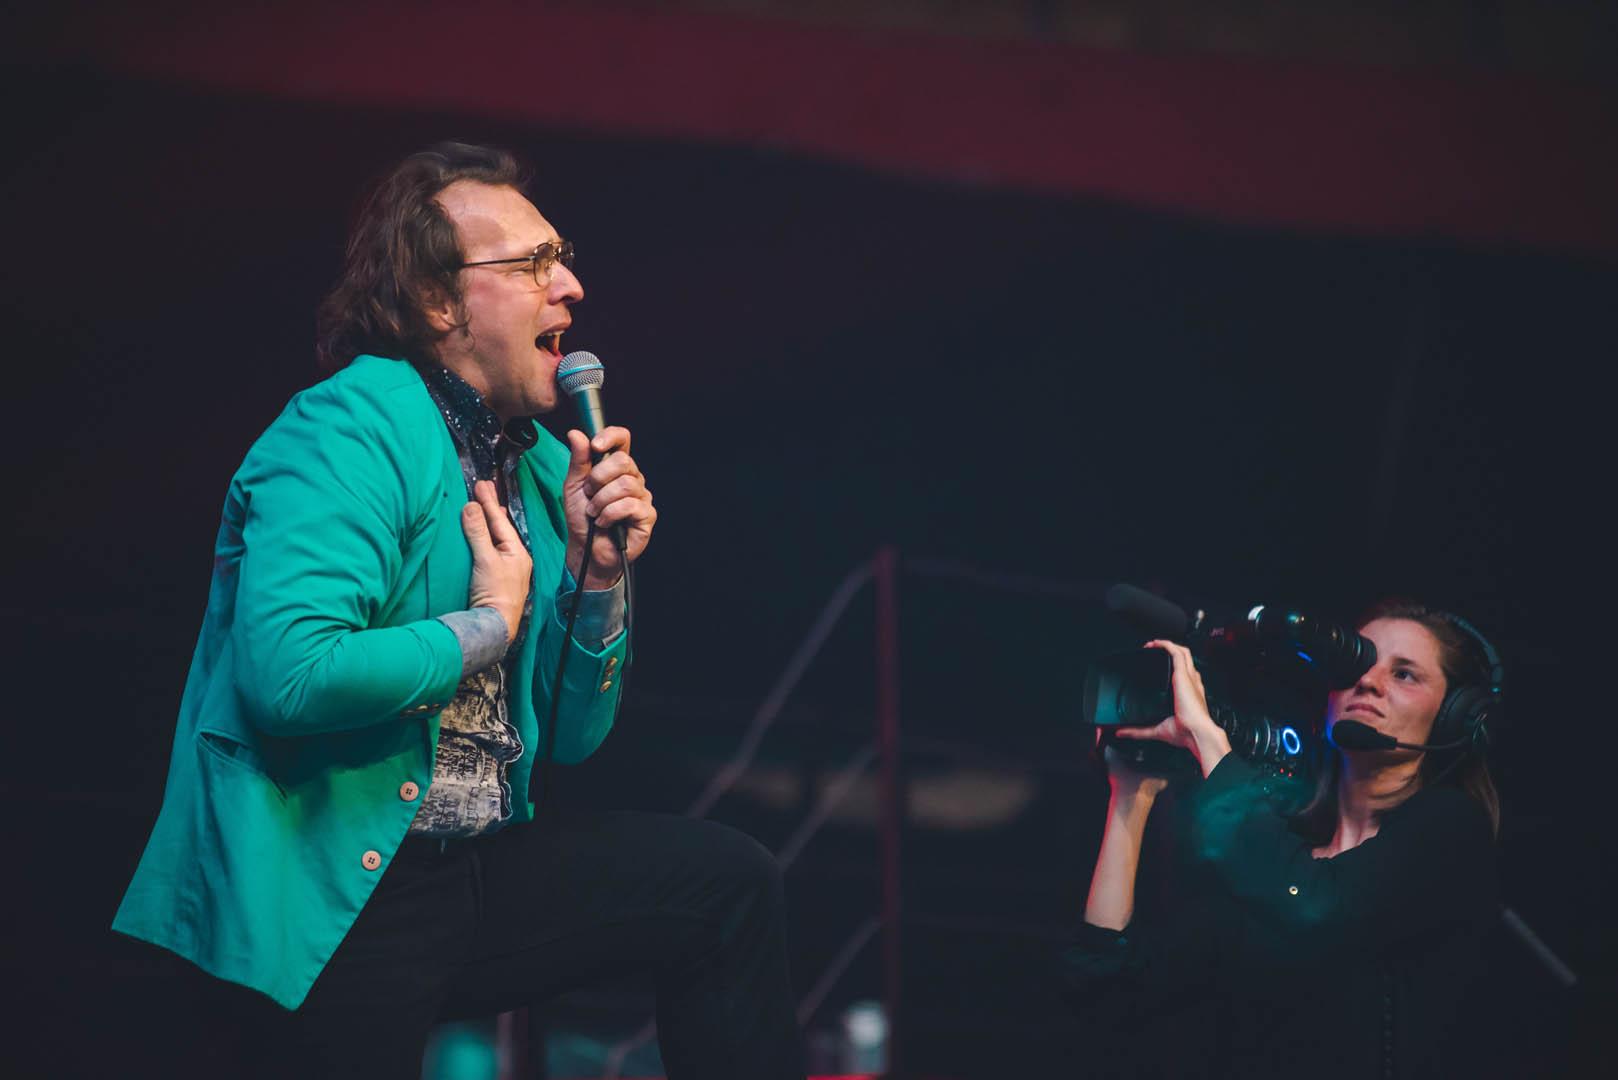 ABVV Event Festival Concert